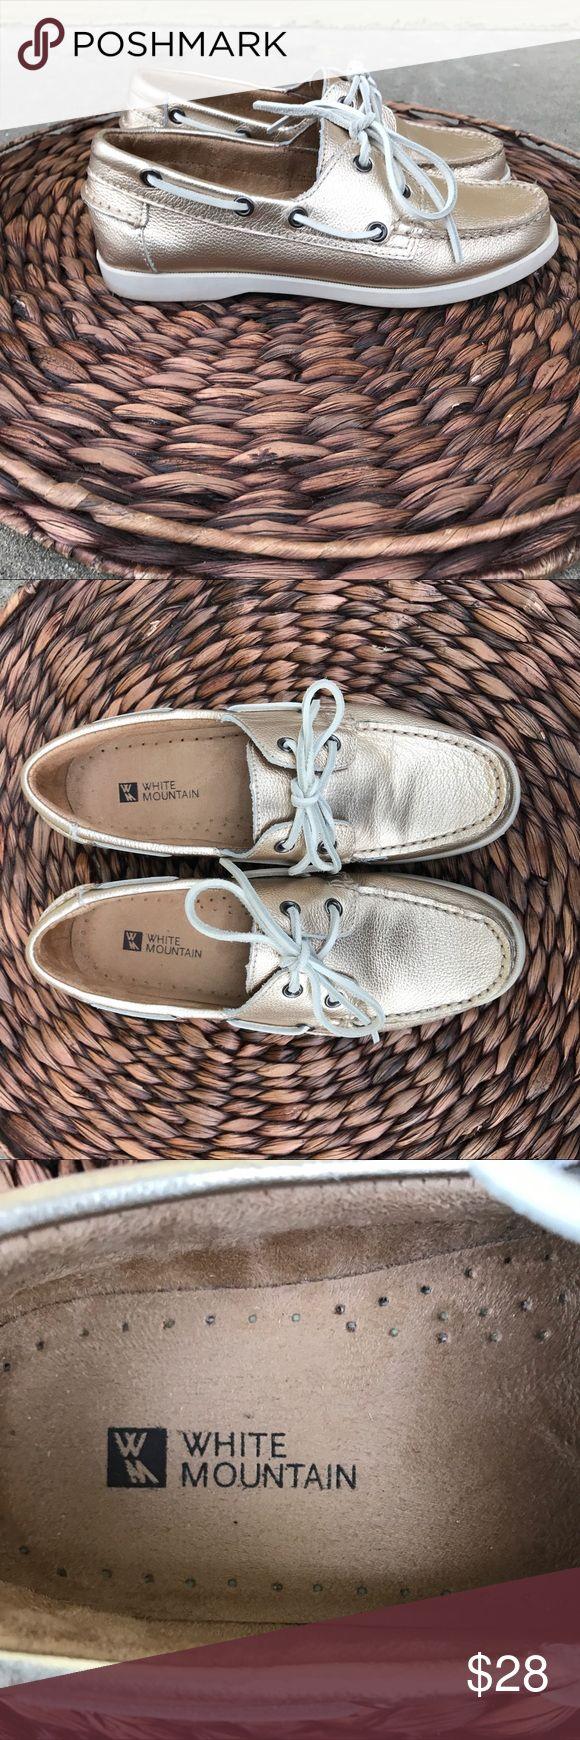 White Mountain Gold Boat Shoes White Mountain boat shoes, great condition, used 2 times. White Mountain Shoes